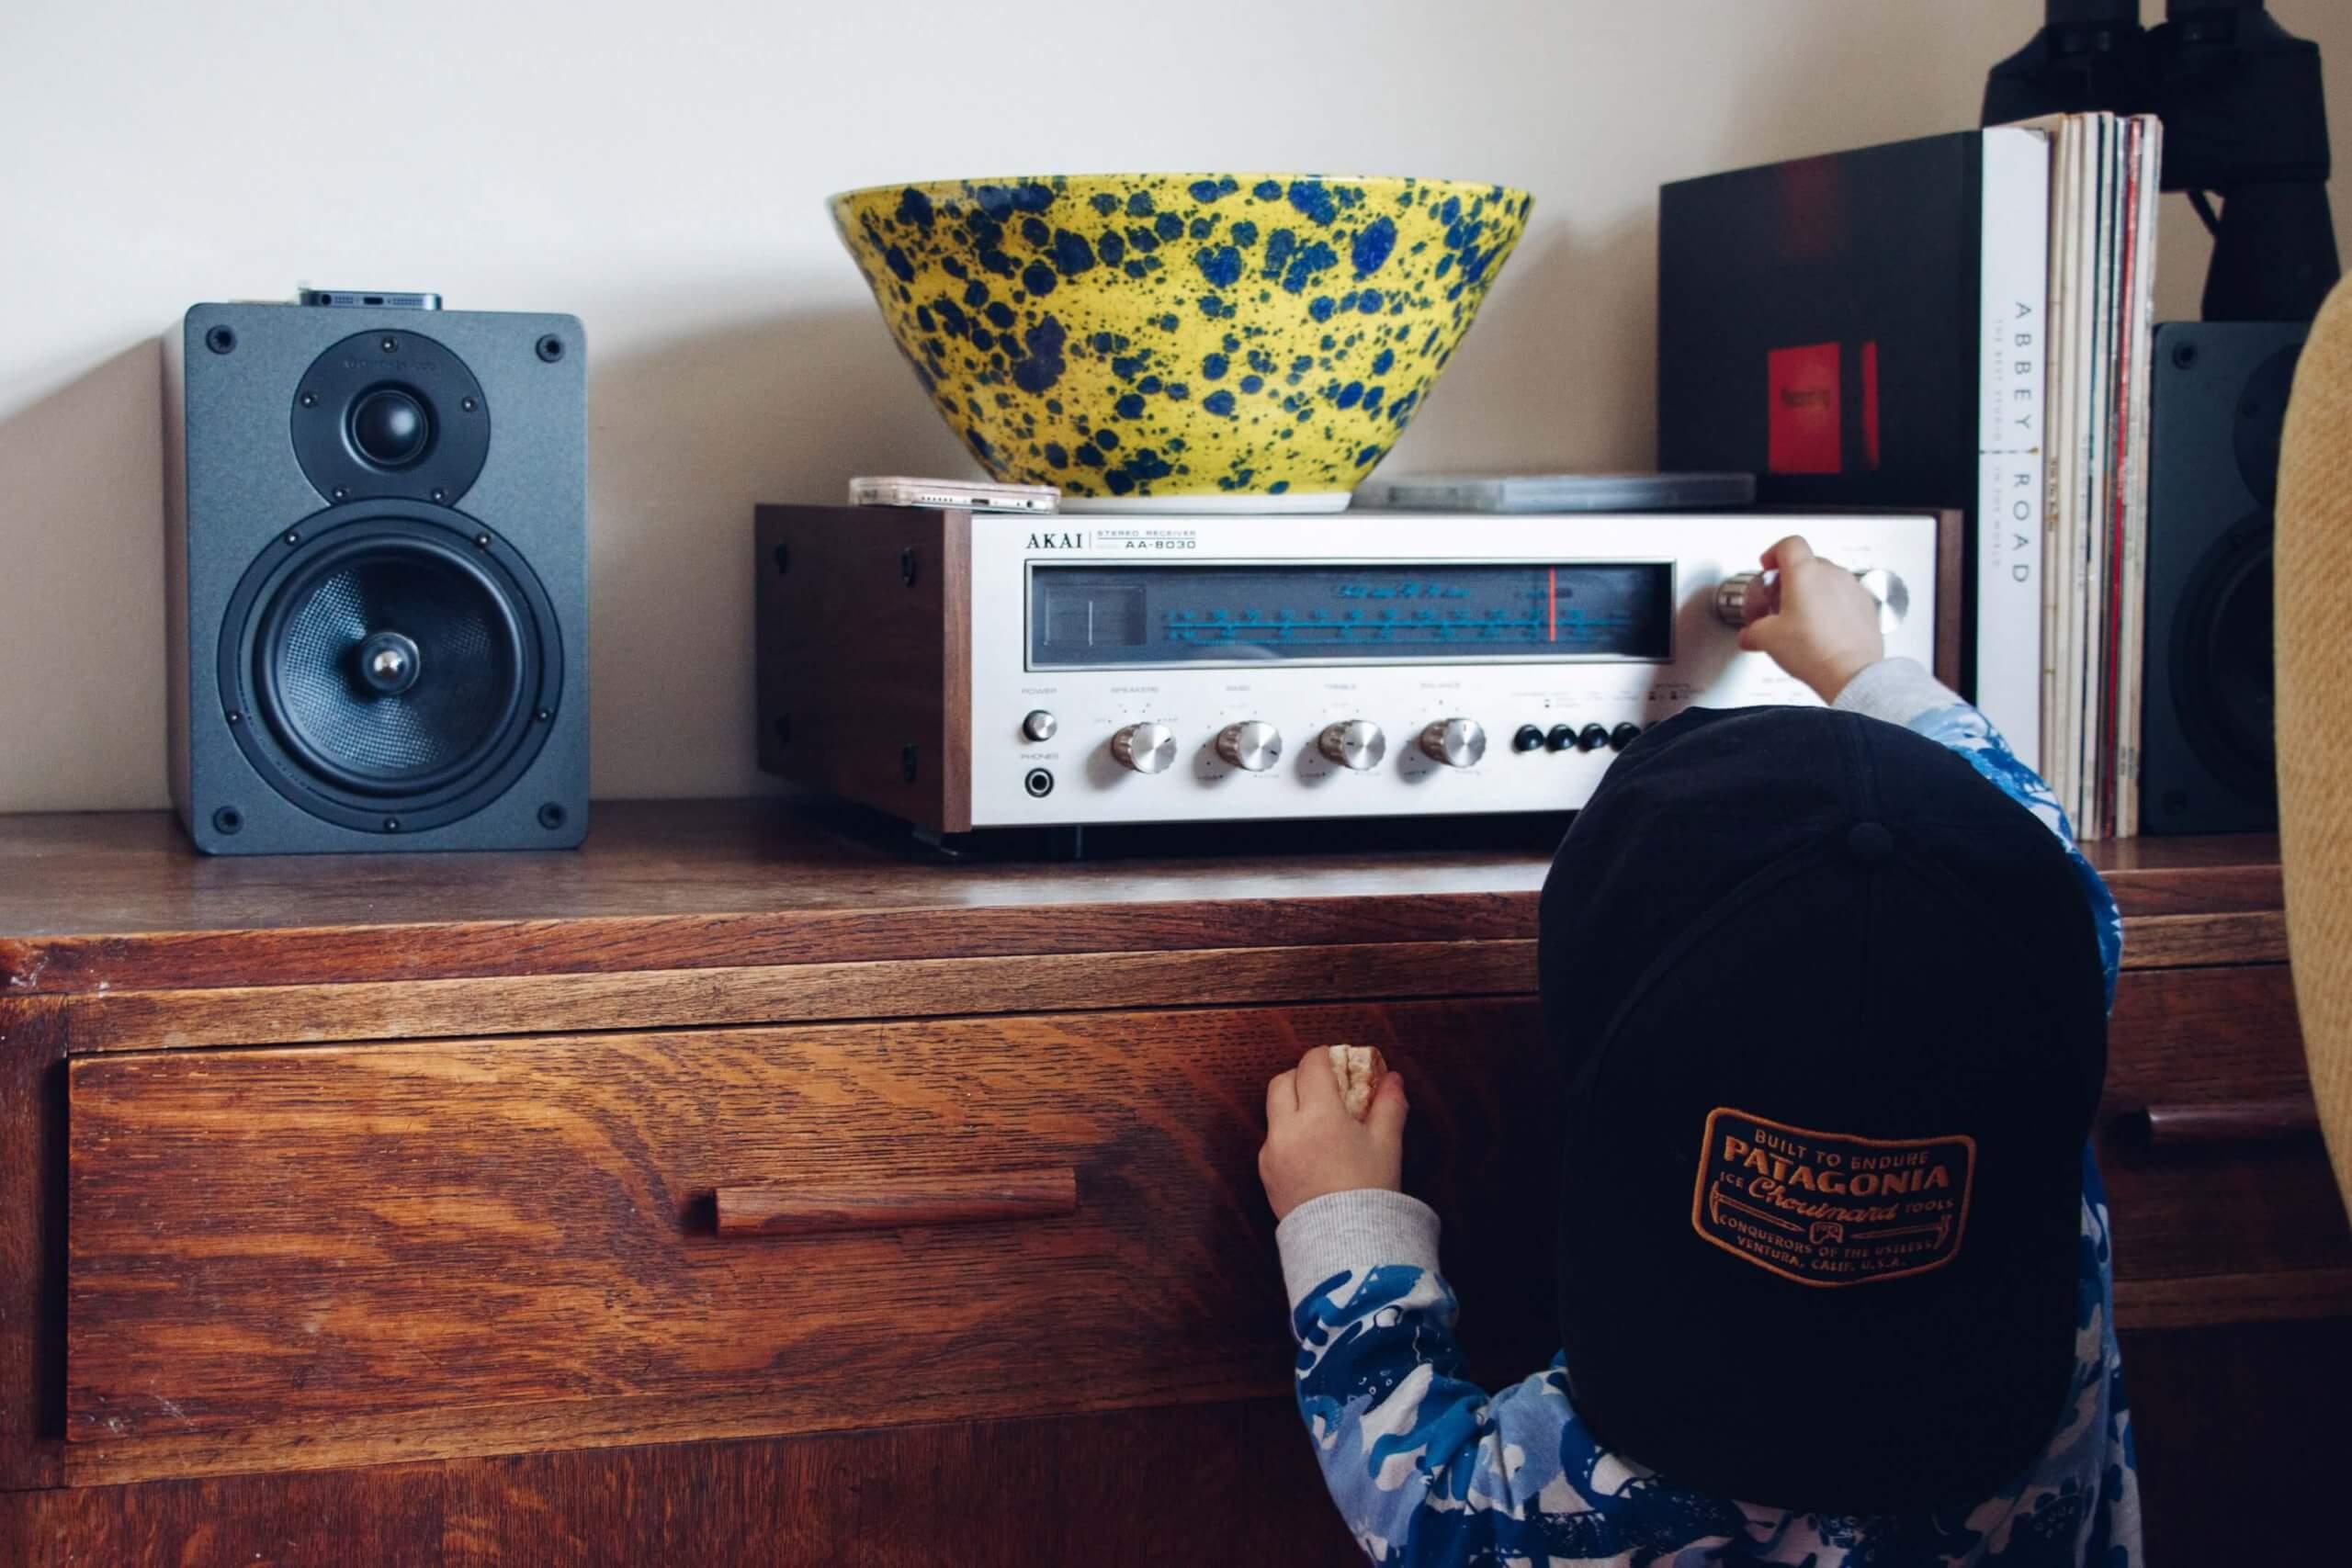 nguoi-duc-va-thoi-quen-nghe-radio